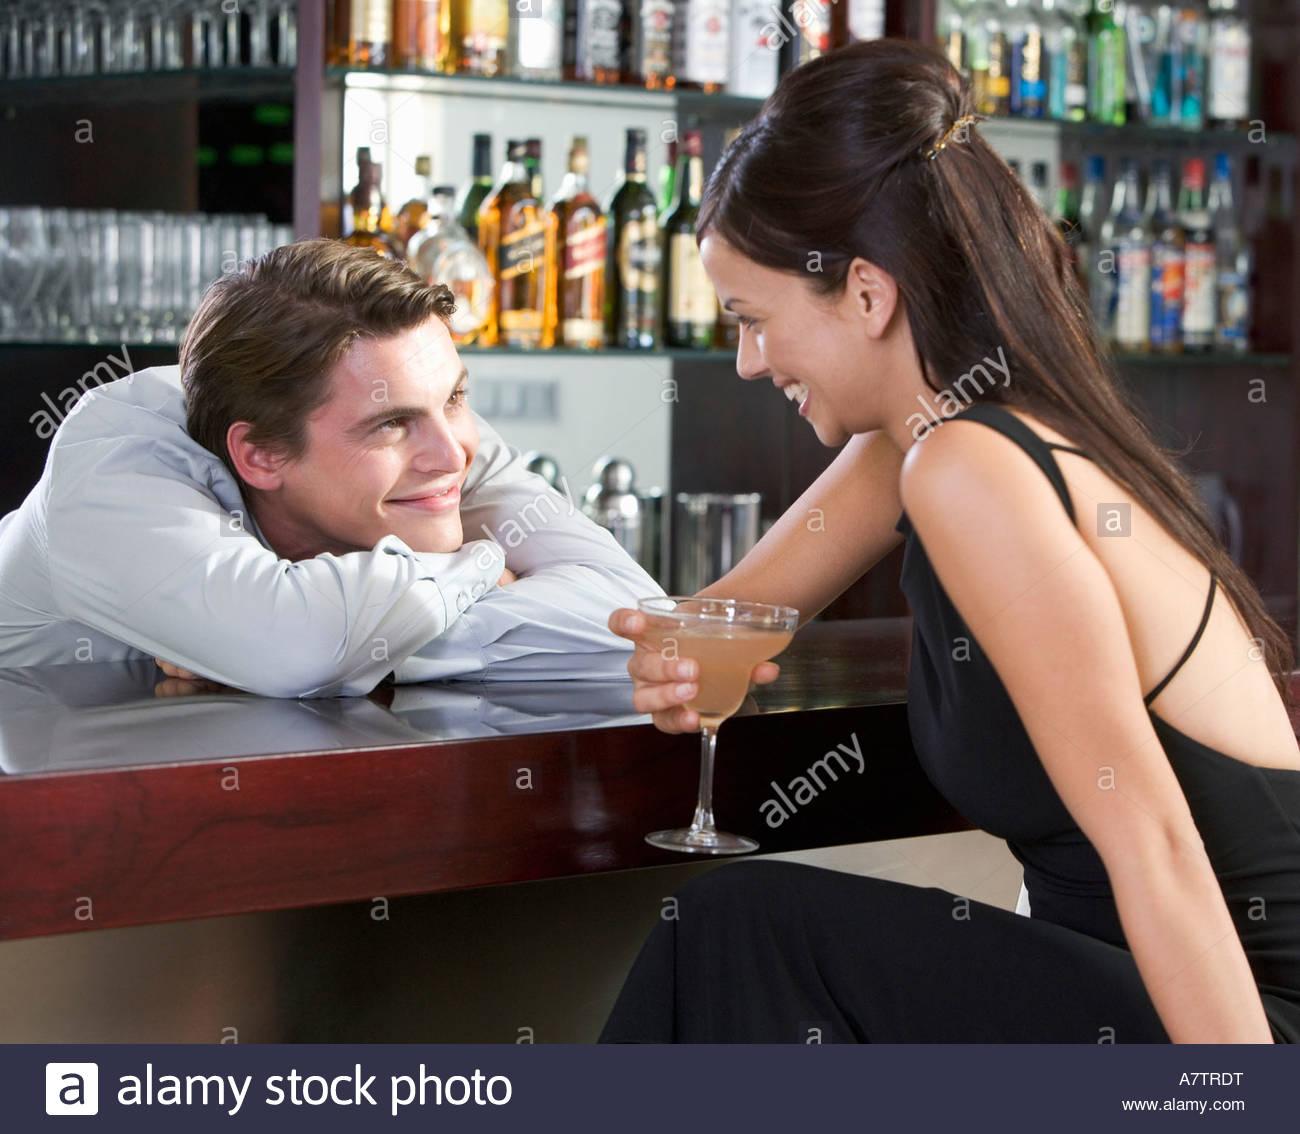 not present beste thai massasje oslo live cam sex ready help